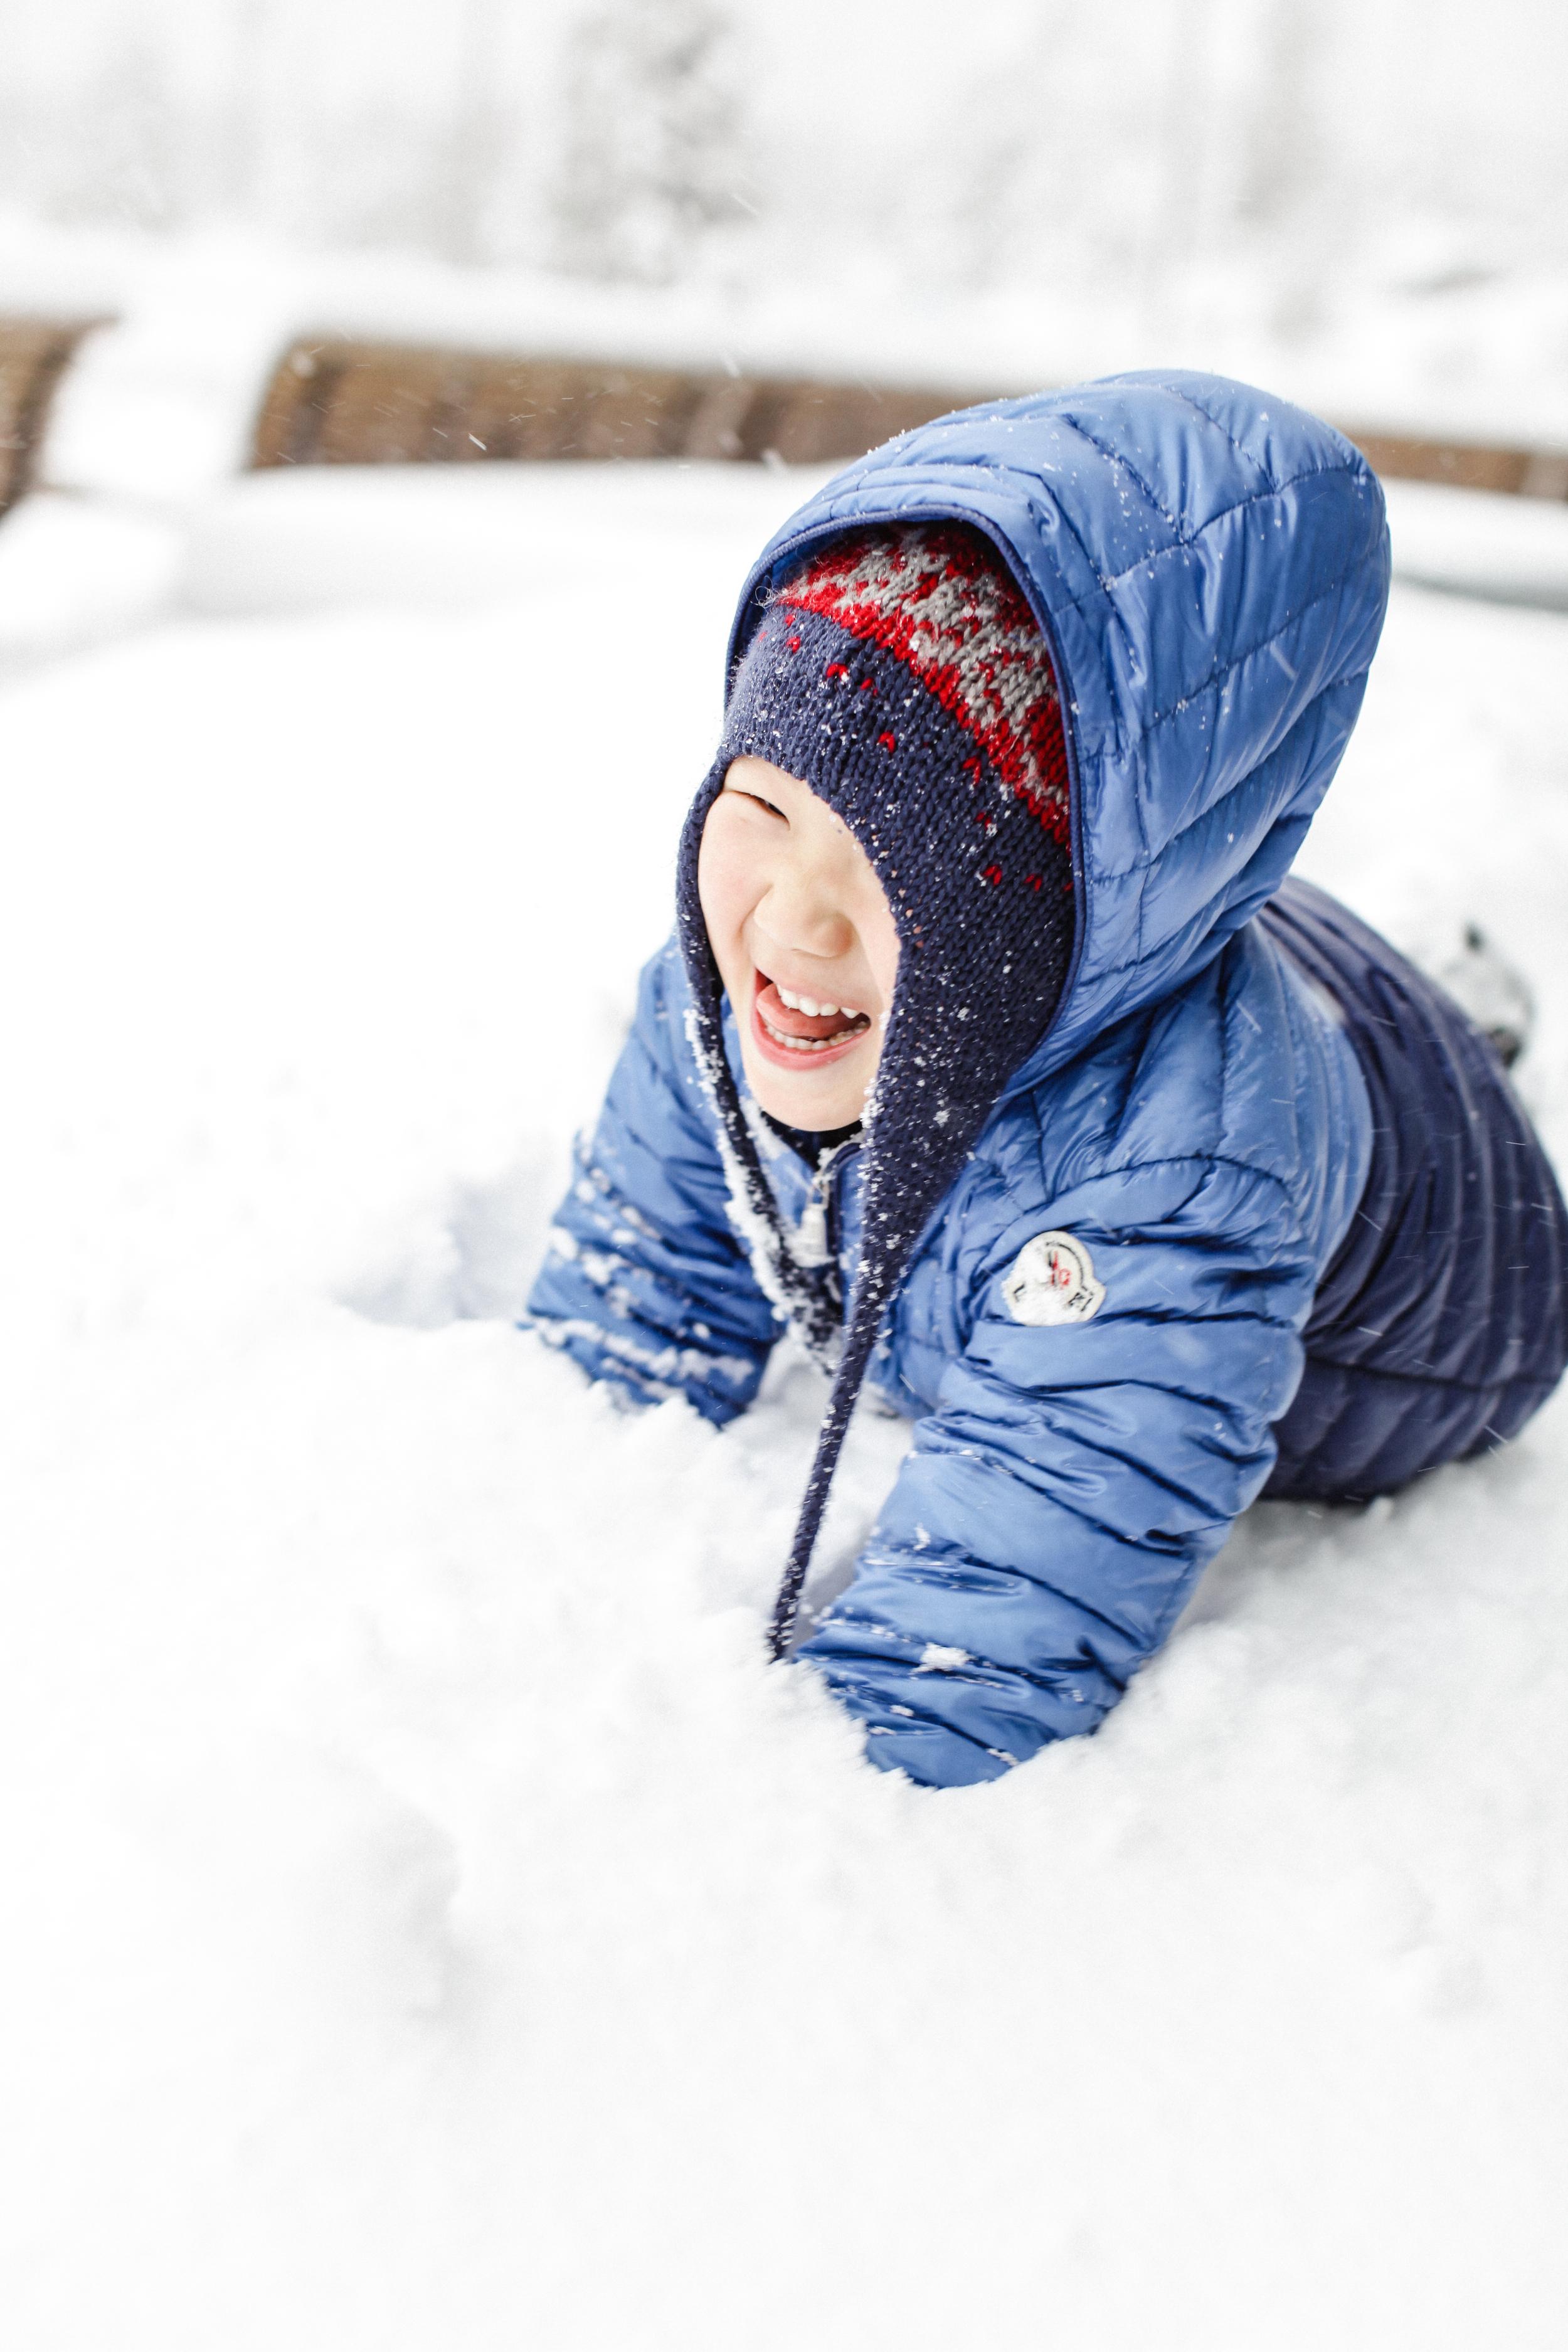 l deng chicago winterstrom blizzard millenium park snowball fight maggie daley ice ribbon -011.jpg